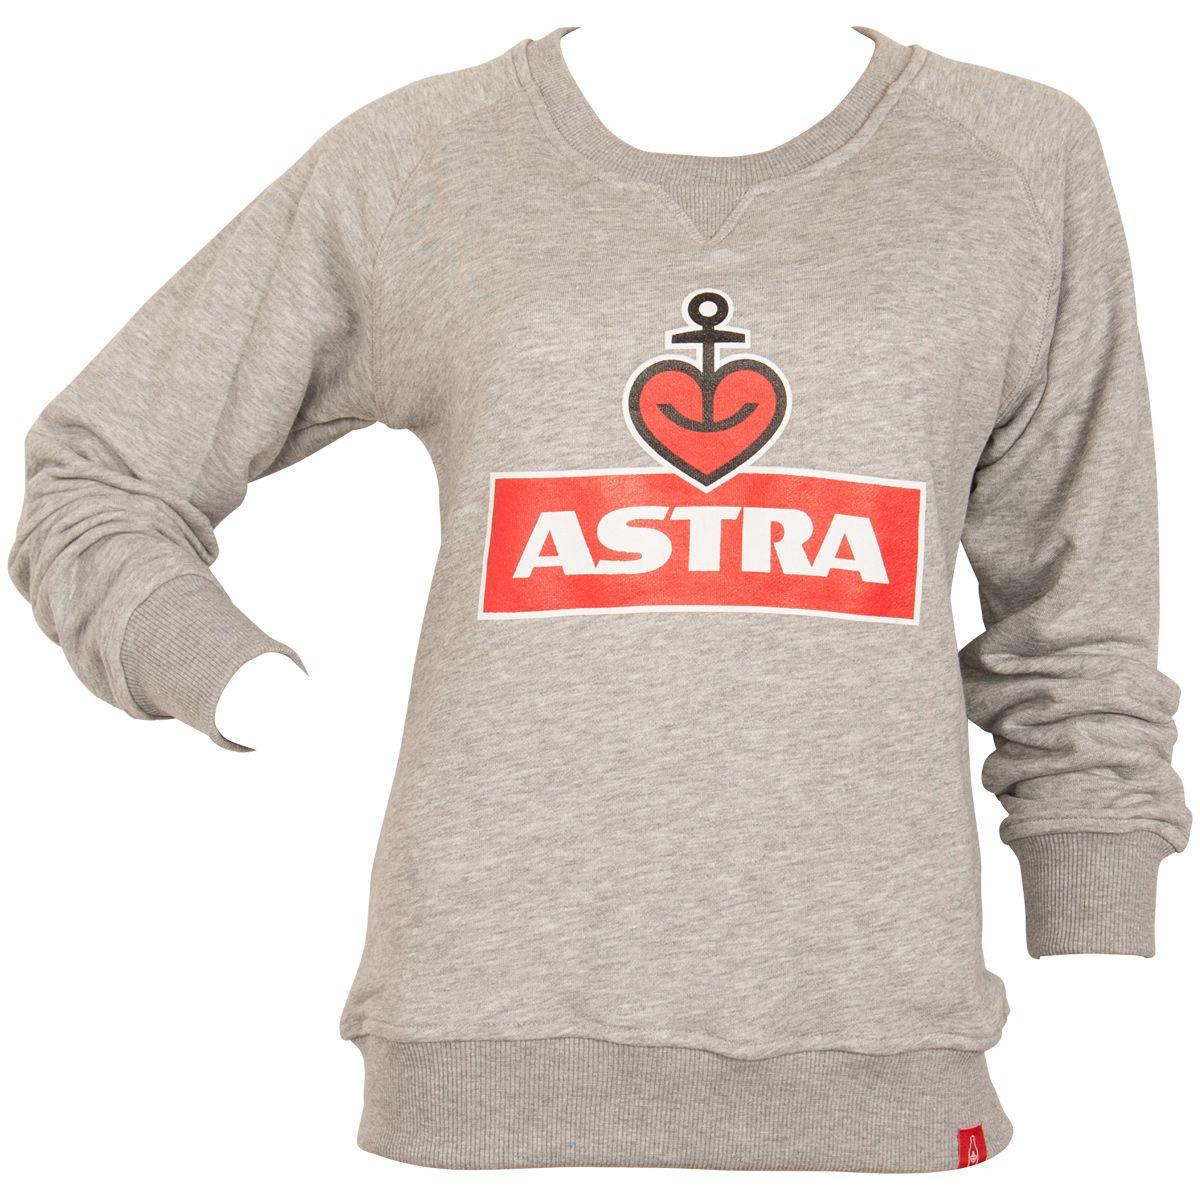 Astra - Damen Sweatshirt Logo - grau